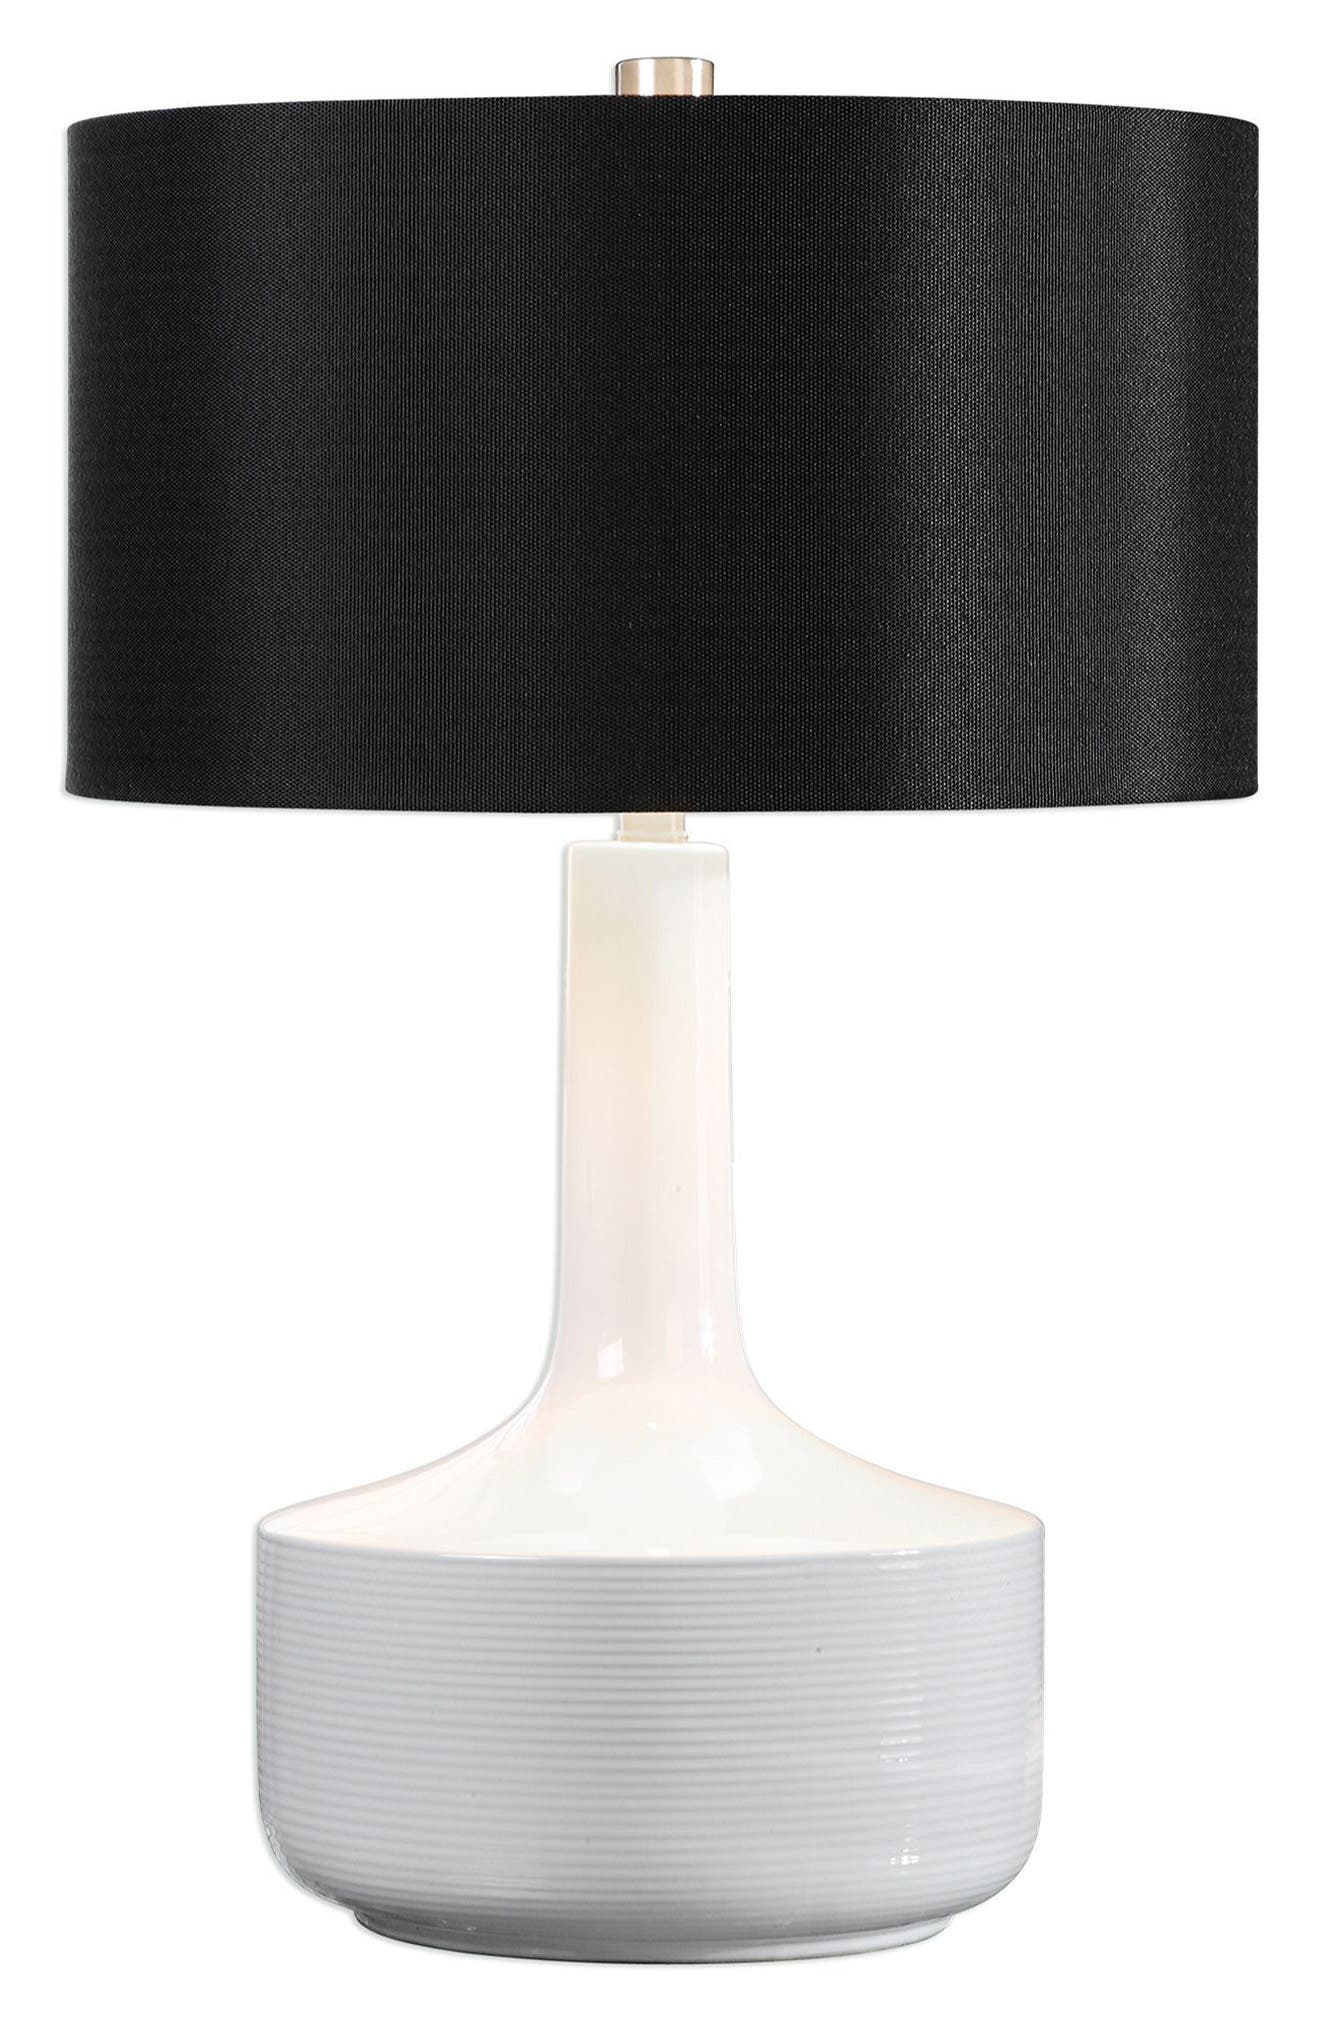 Main Image - Uttermost Drenova Table Lamp